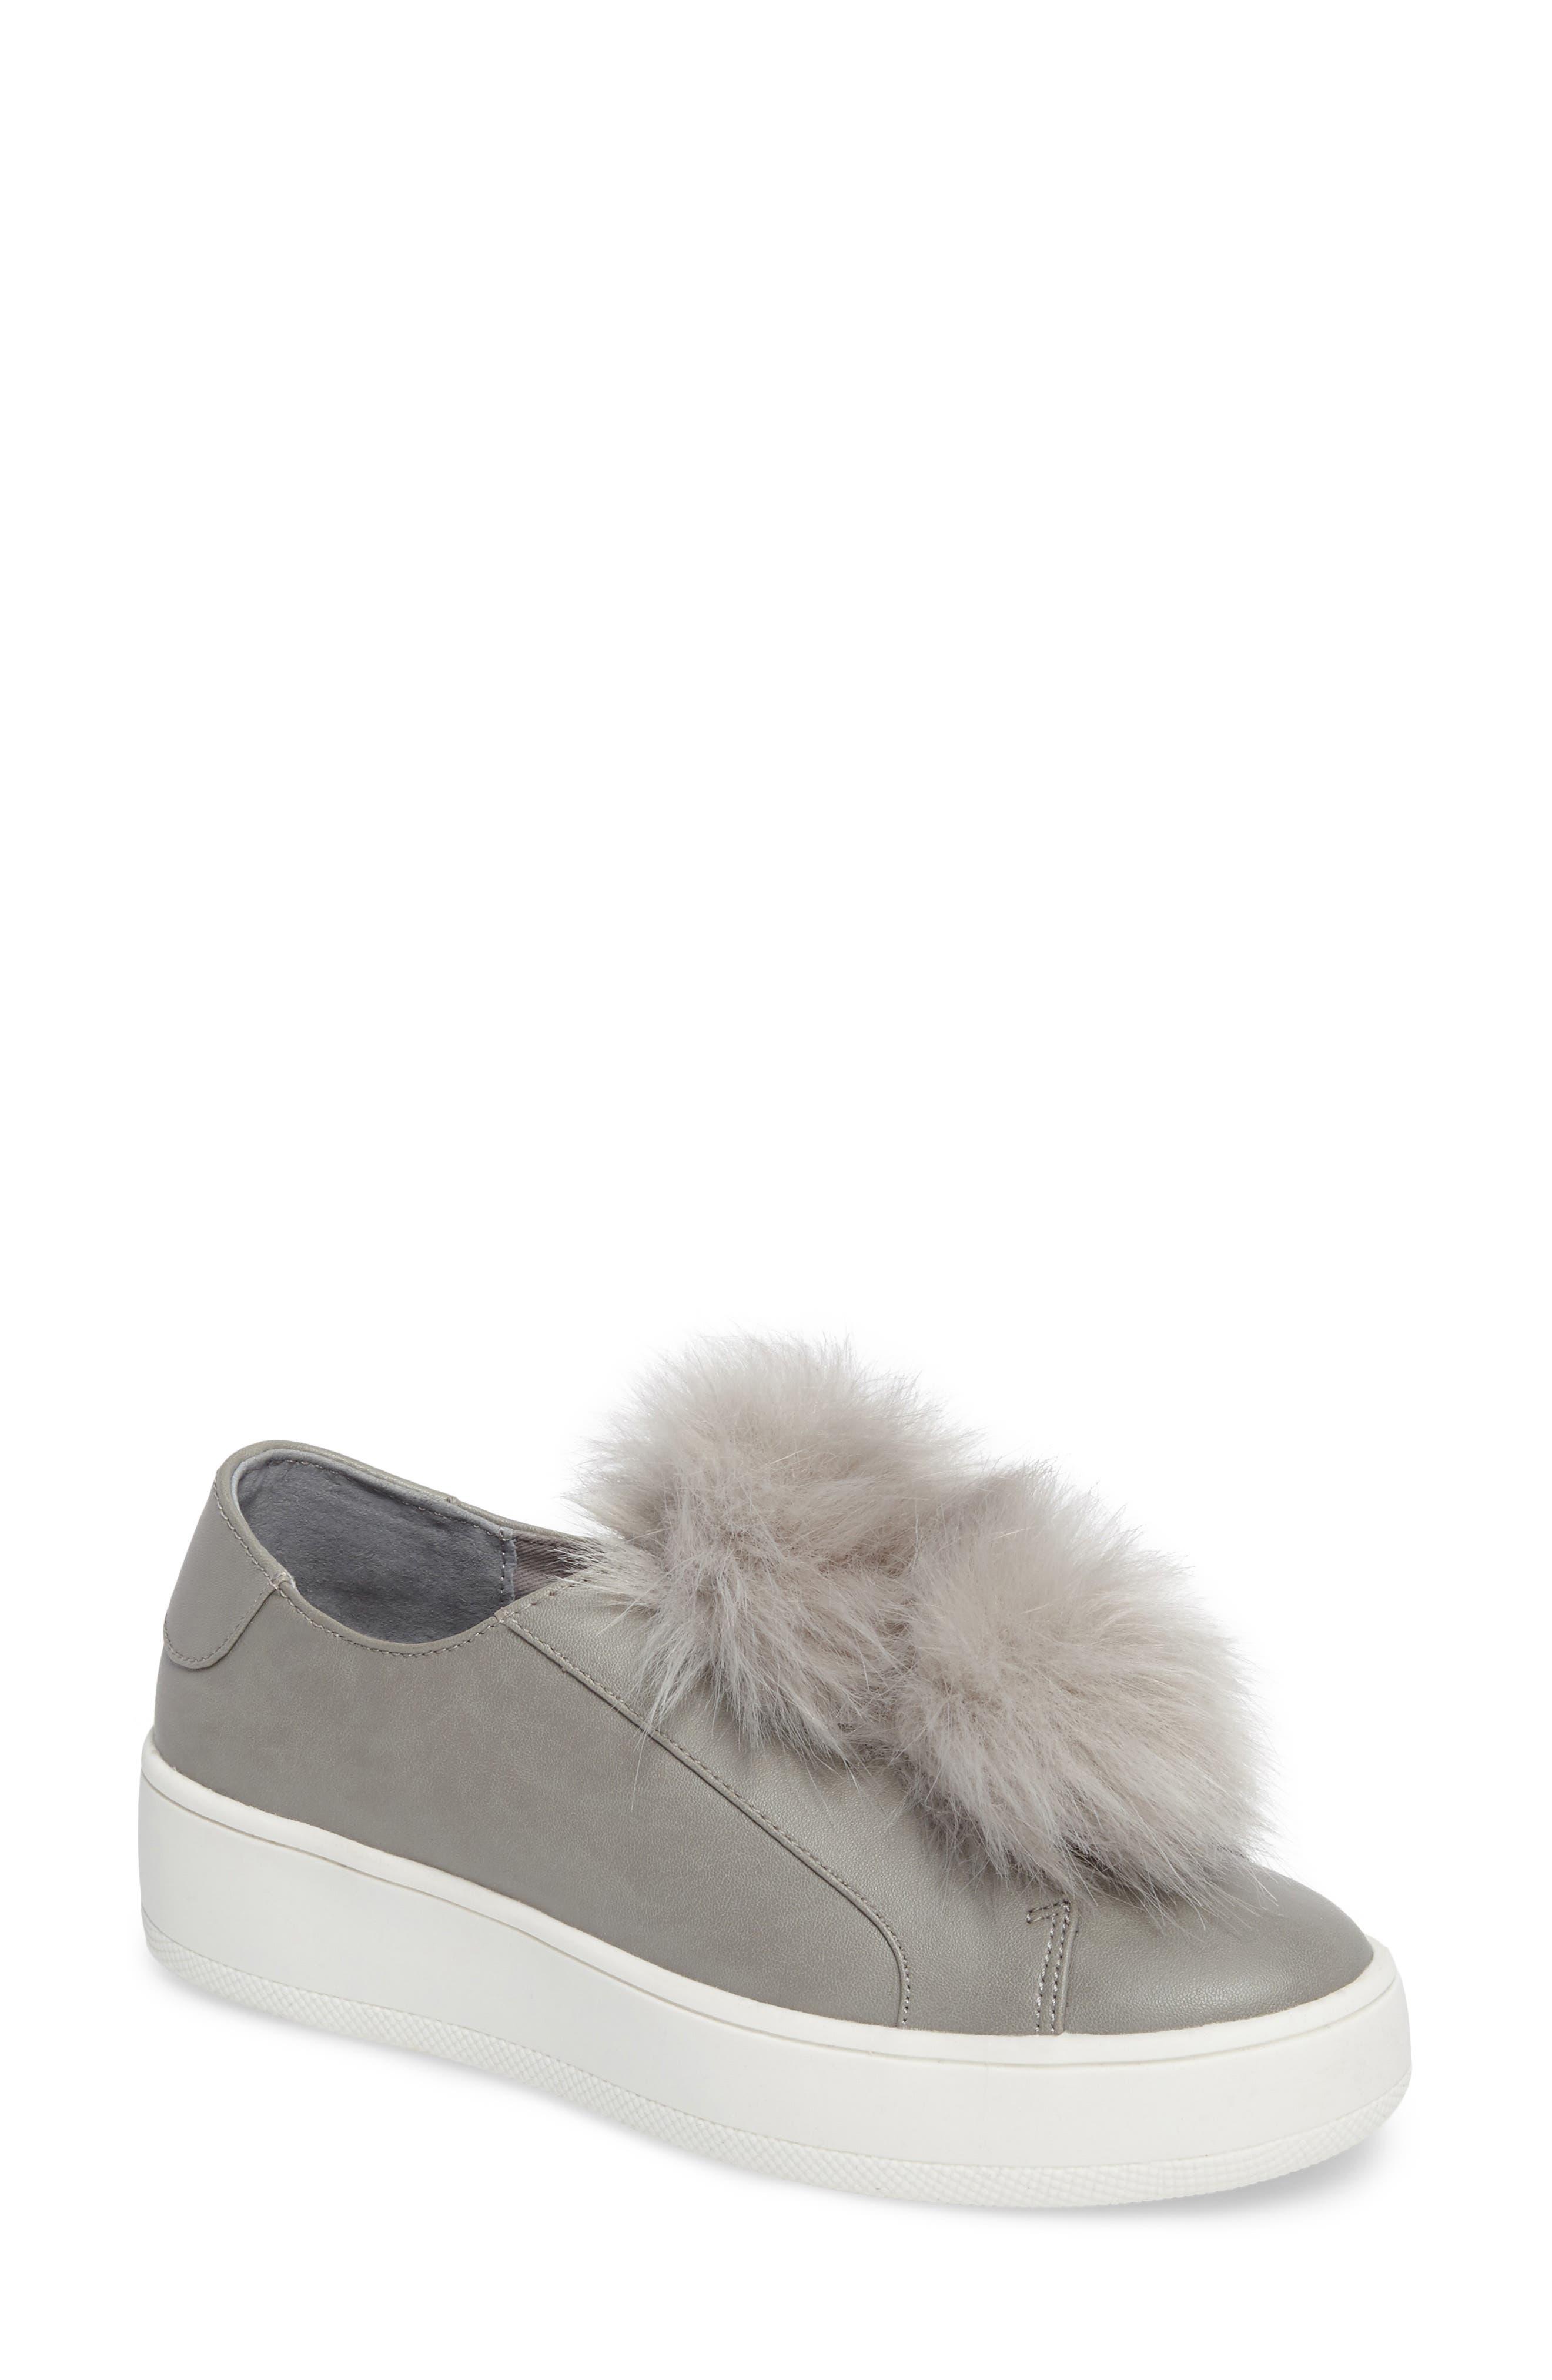 Breeze Faux Fur Pom Sneaker,                         Main,                         color, Grey